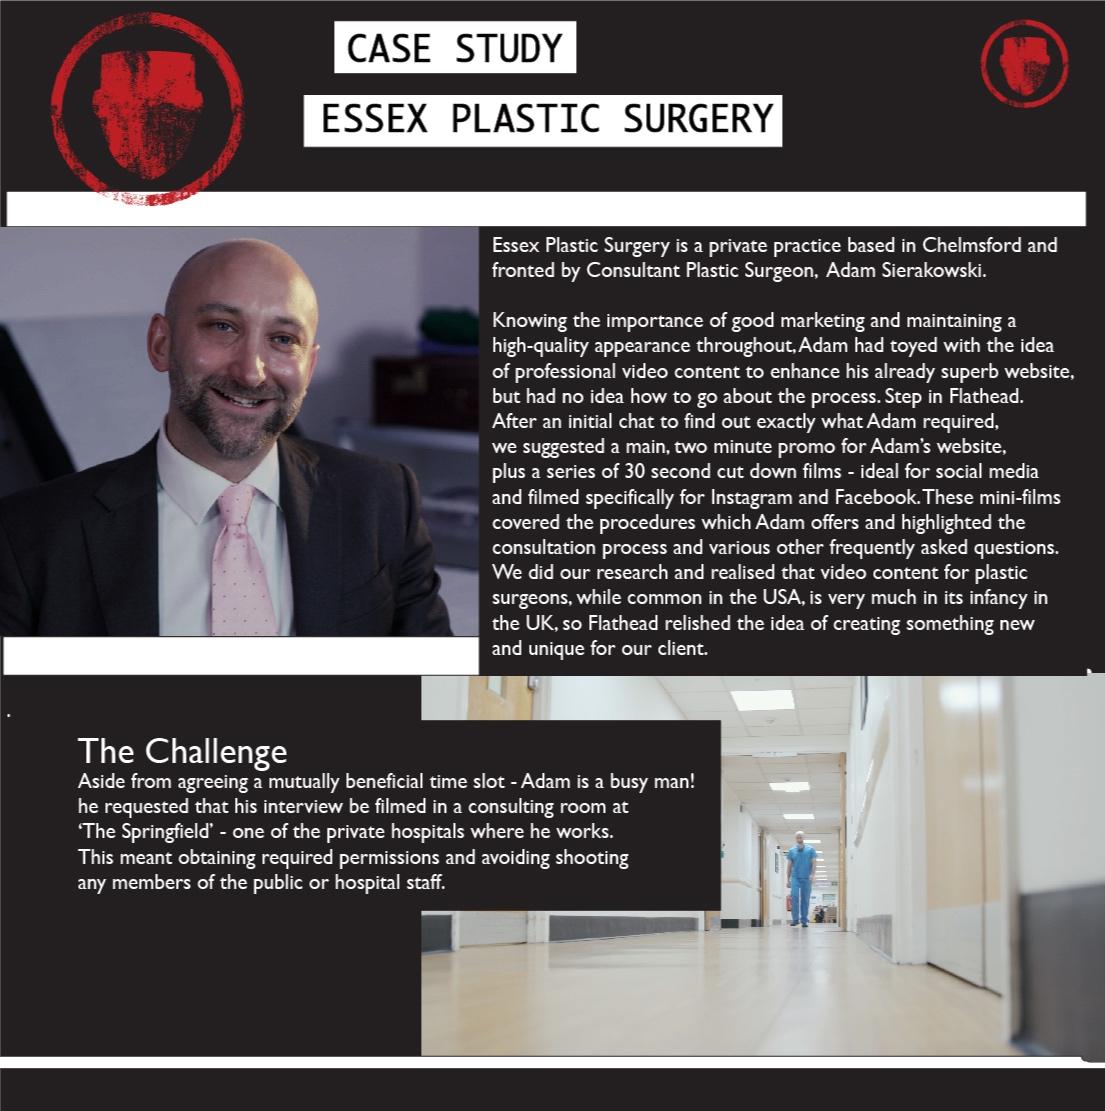 CS_Plastic_Surgery_1.jpg